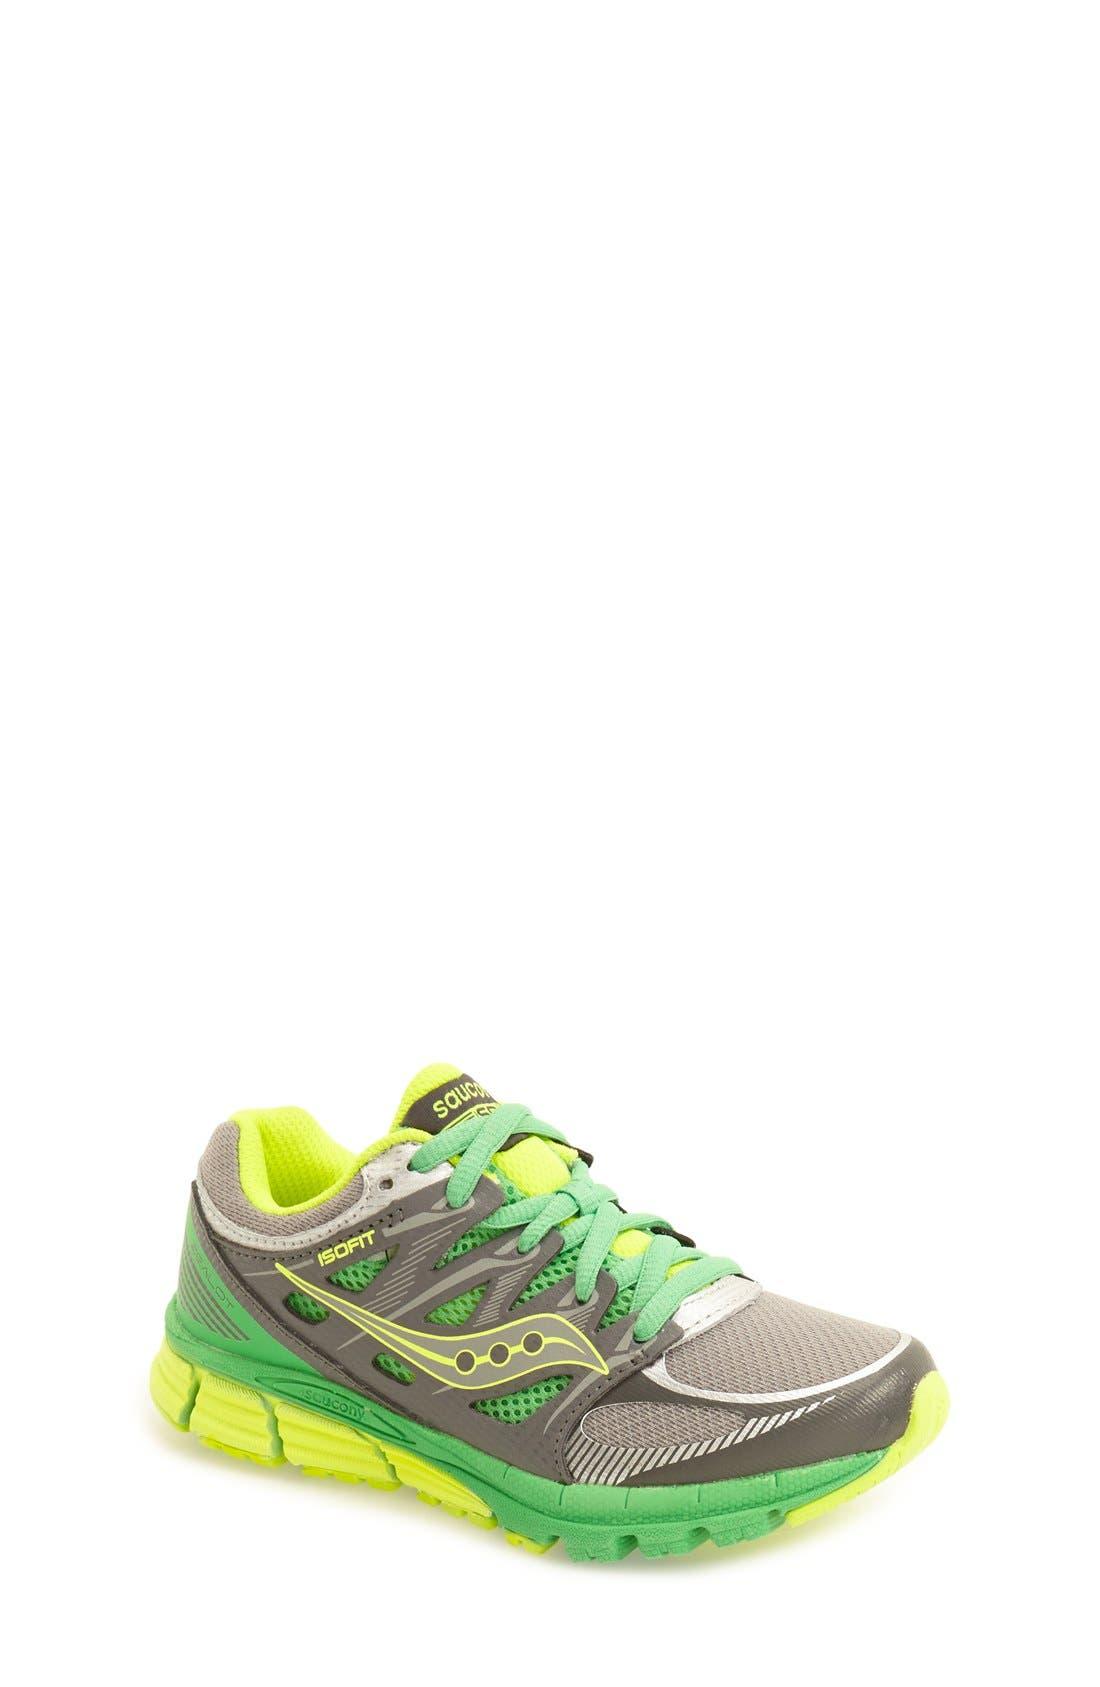 Alternate Image 1 Selected - Saucony 'Zealot' Athletic Shoe (Toddler, Little Kid & Big Kid)